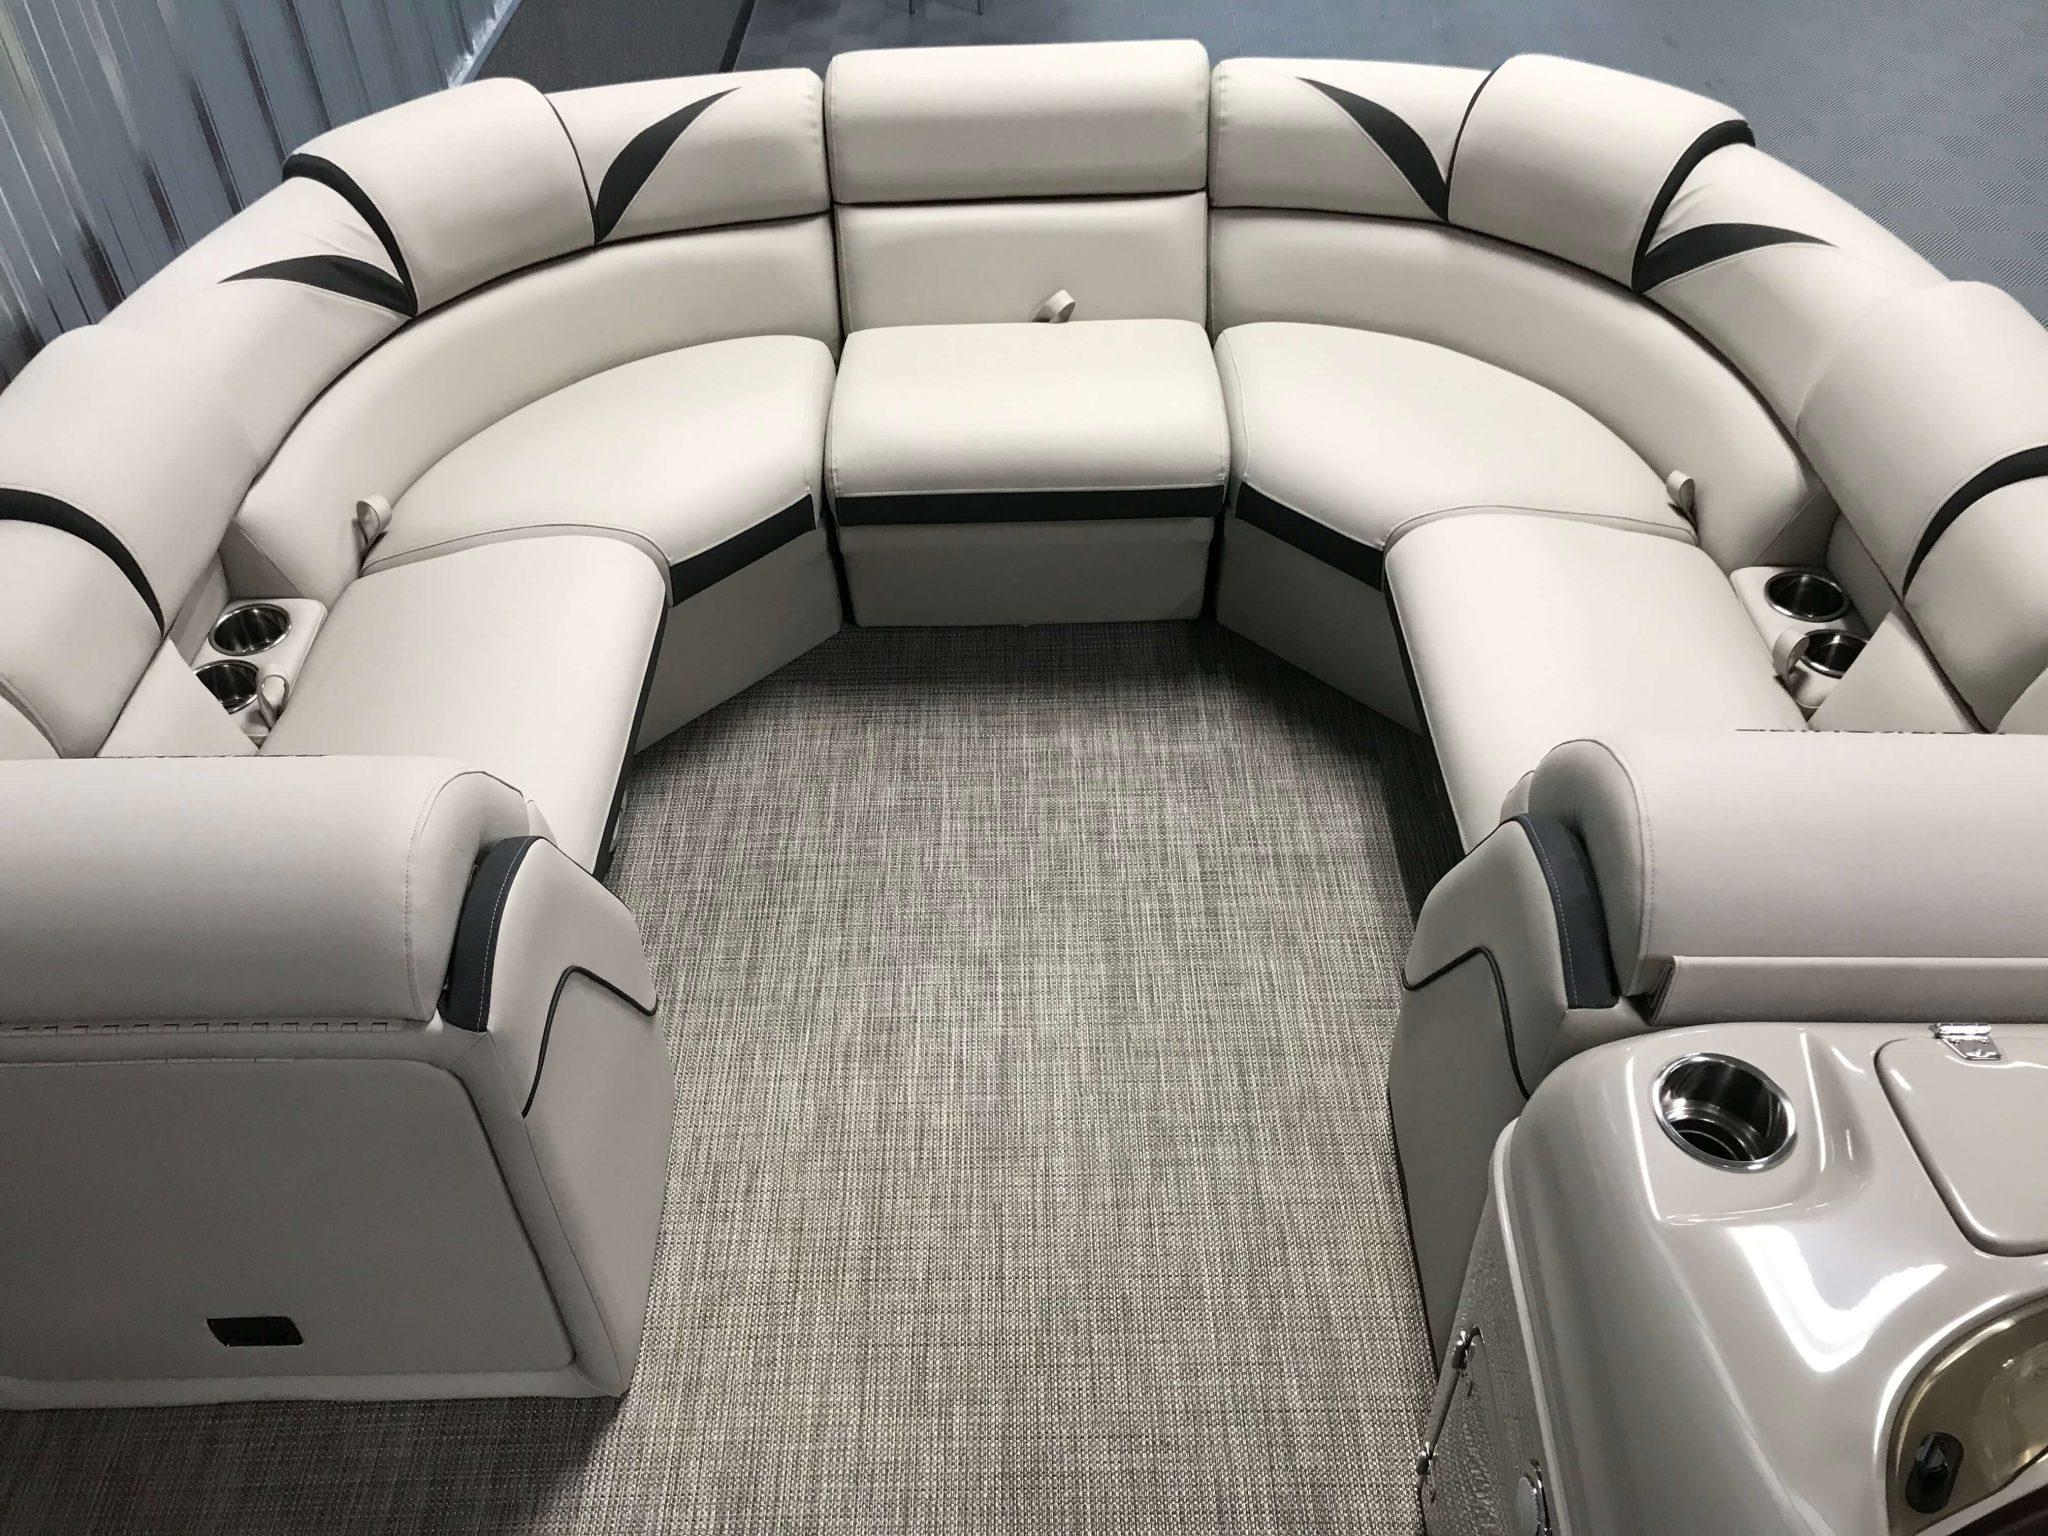 2019 Berkshire 23RFX STS Deluxe Interior Cockpit Layout 5